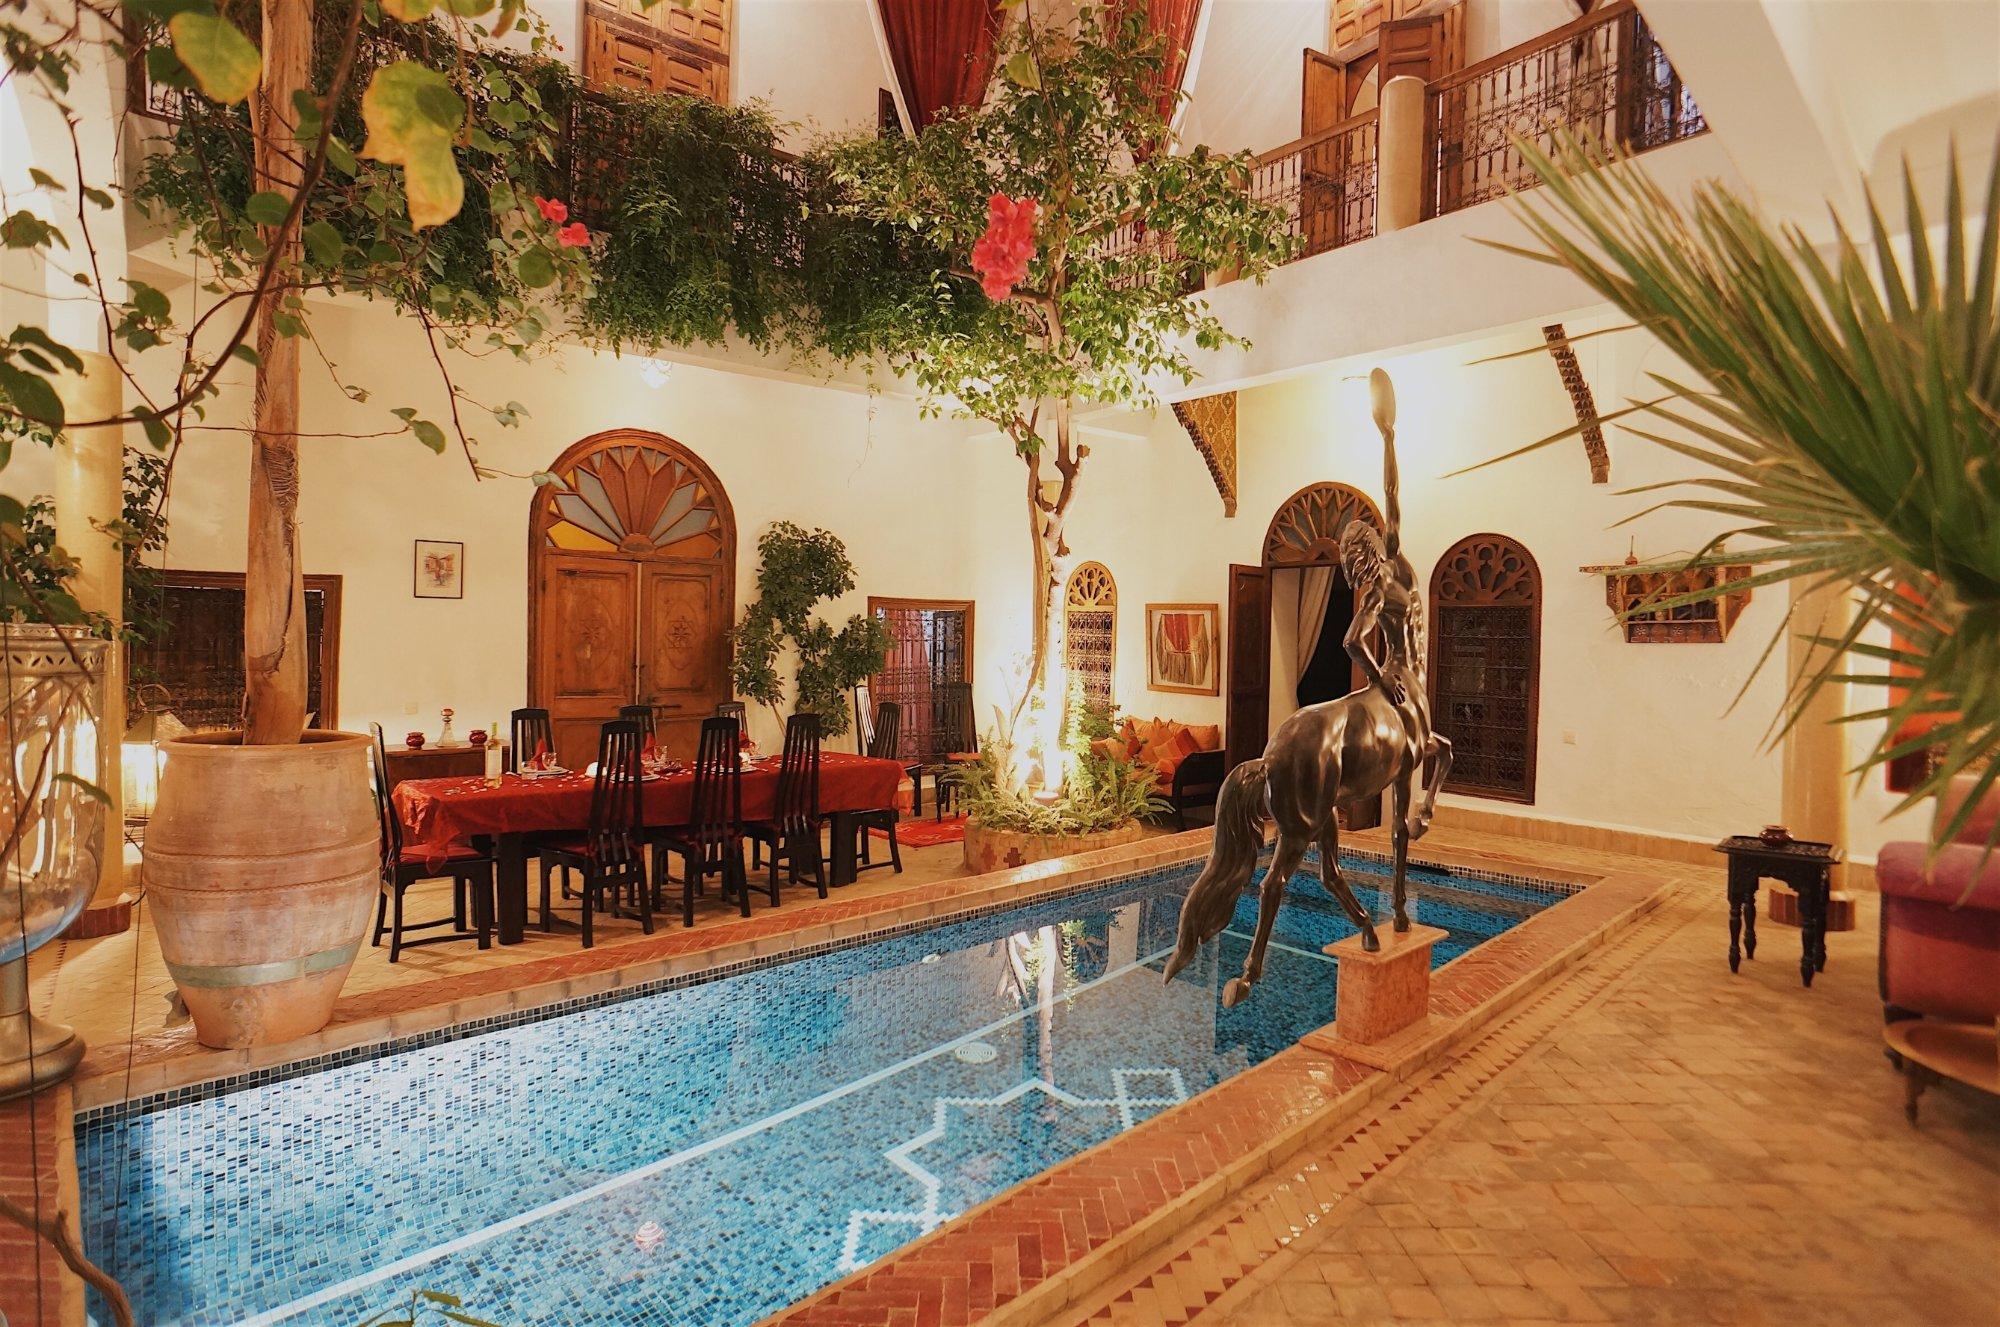 Riad El Zohar Plunge-pool-in-courtyard - Marrakech